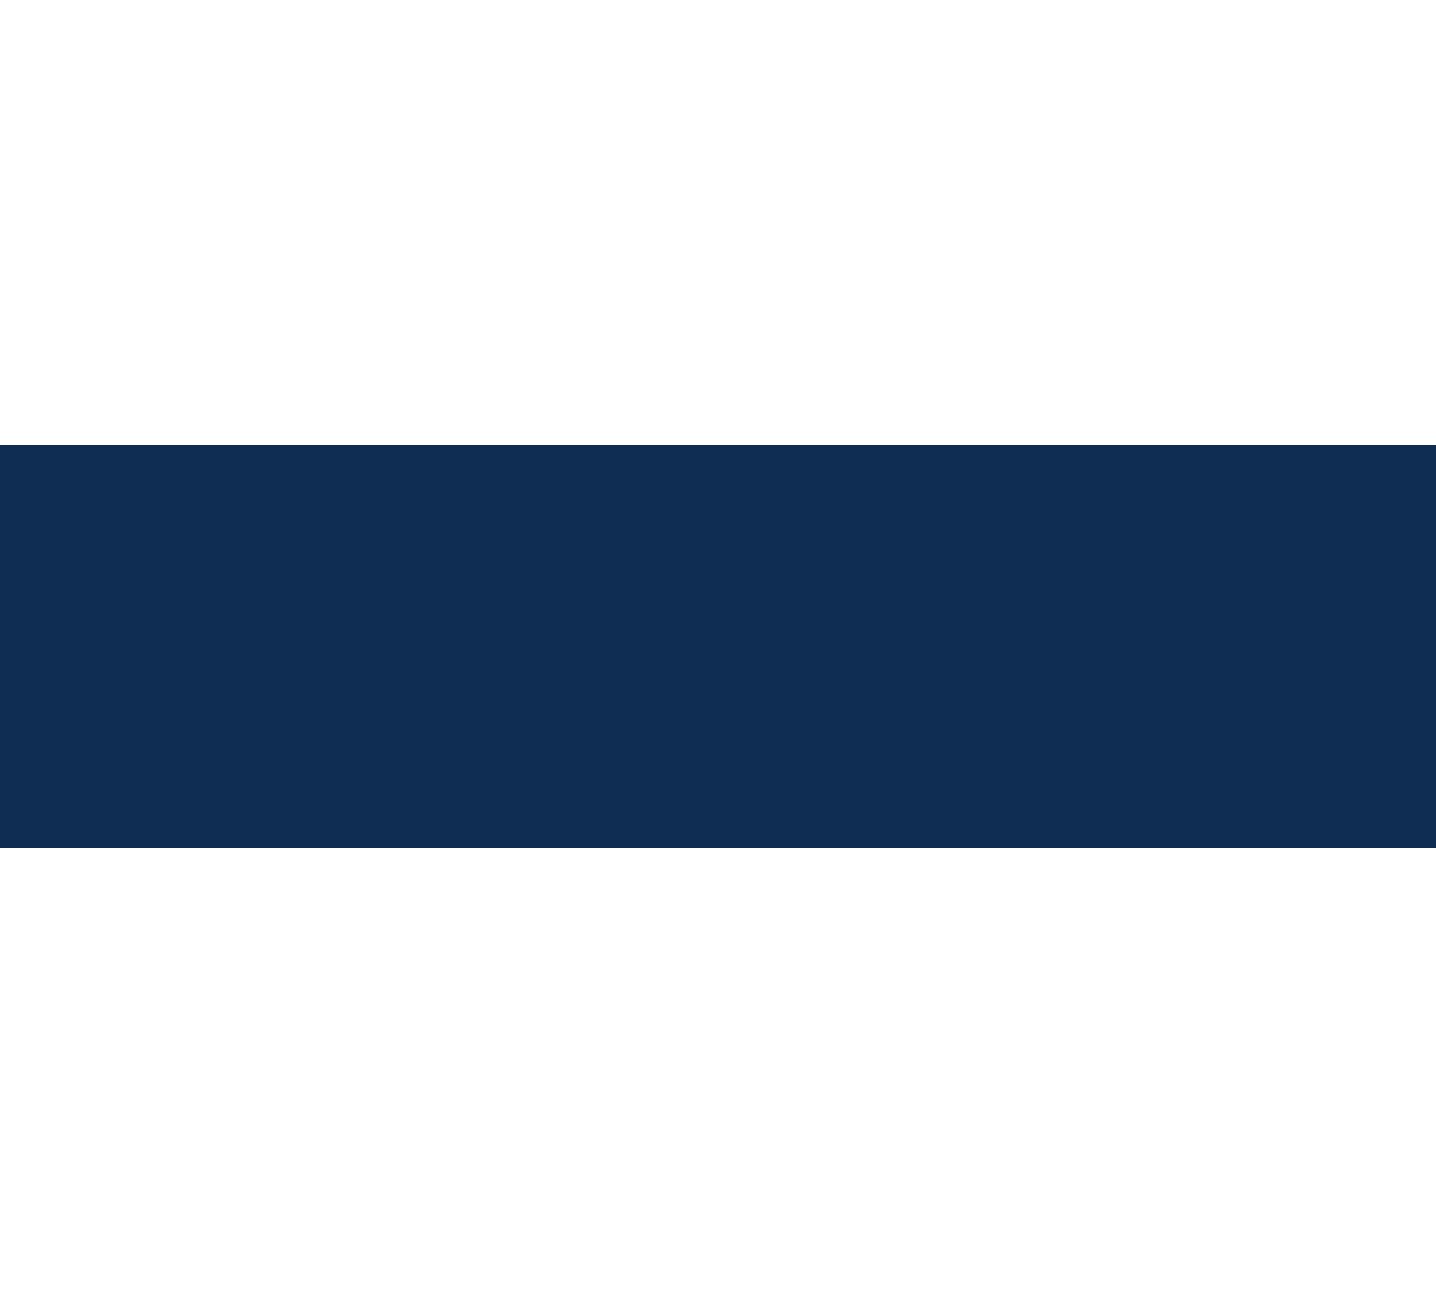 University of California - Merced